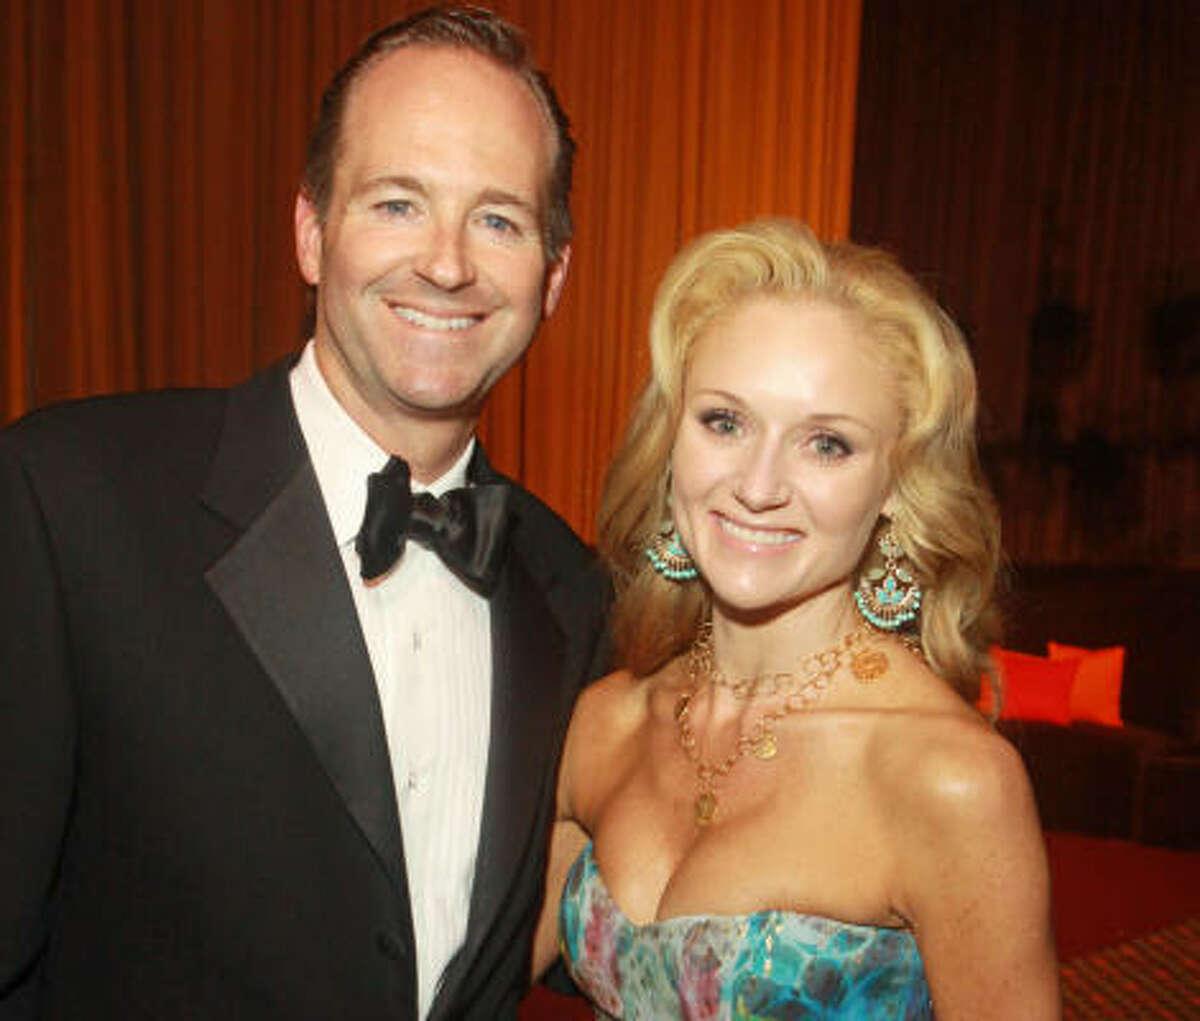 Melissa and Rep. Craig Eiland